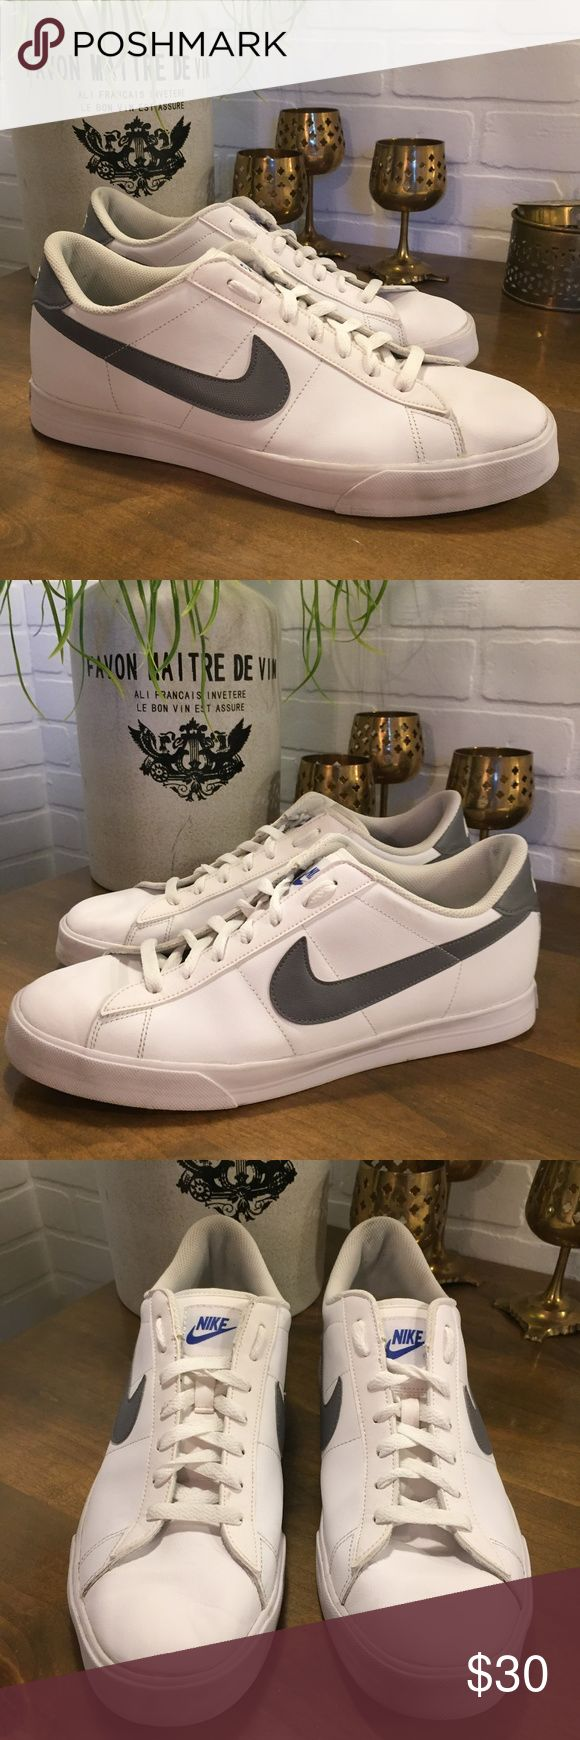 MBT Tariki Sneaker Men Shoes Beige 350306